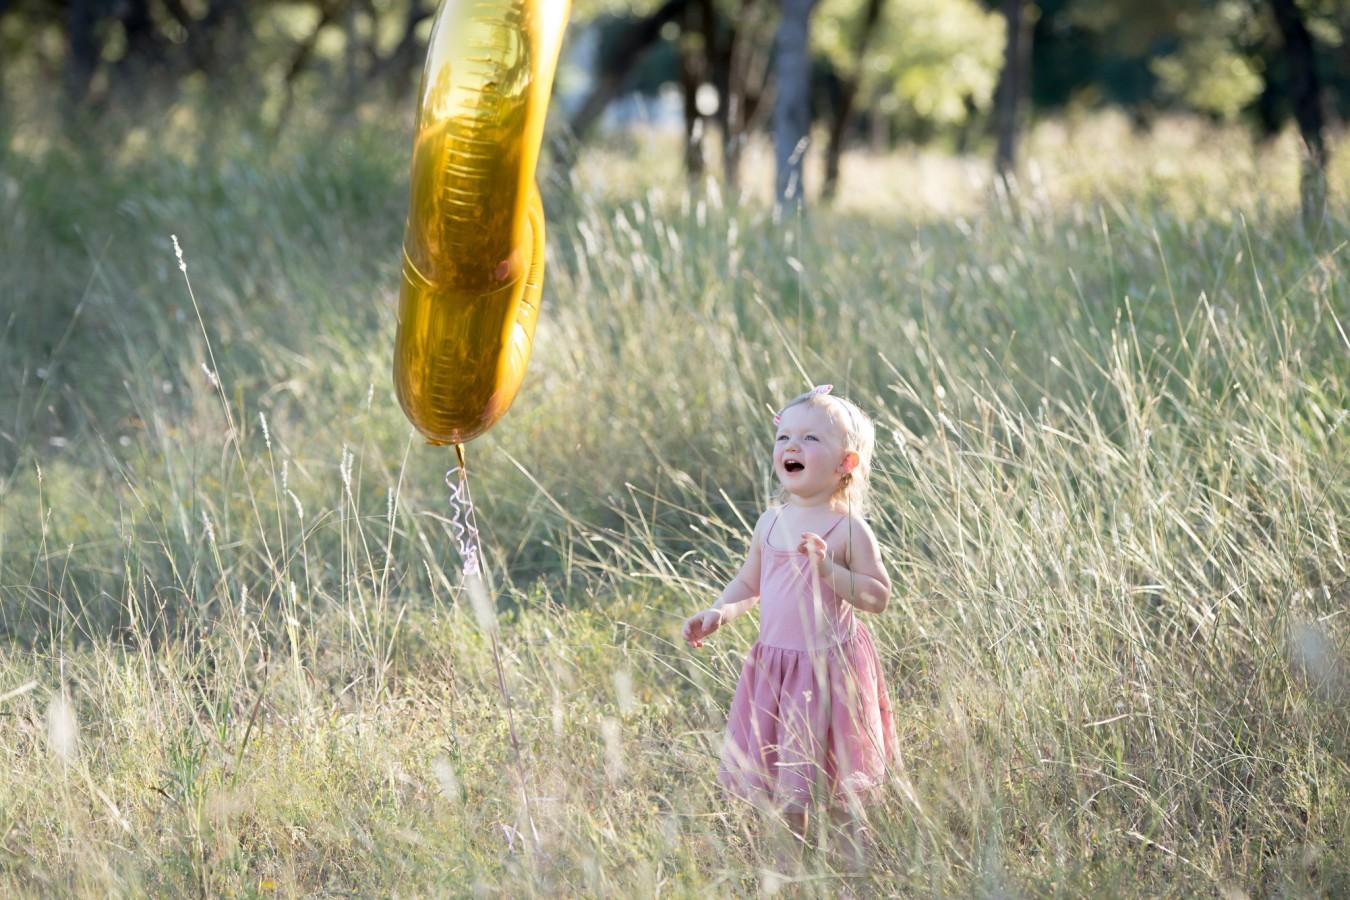 HighDotStudios - Birthdays and Milestones (7)